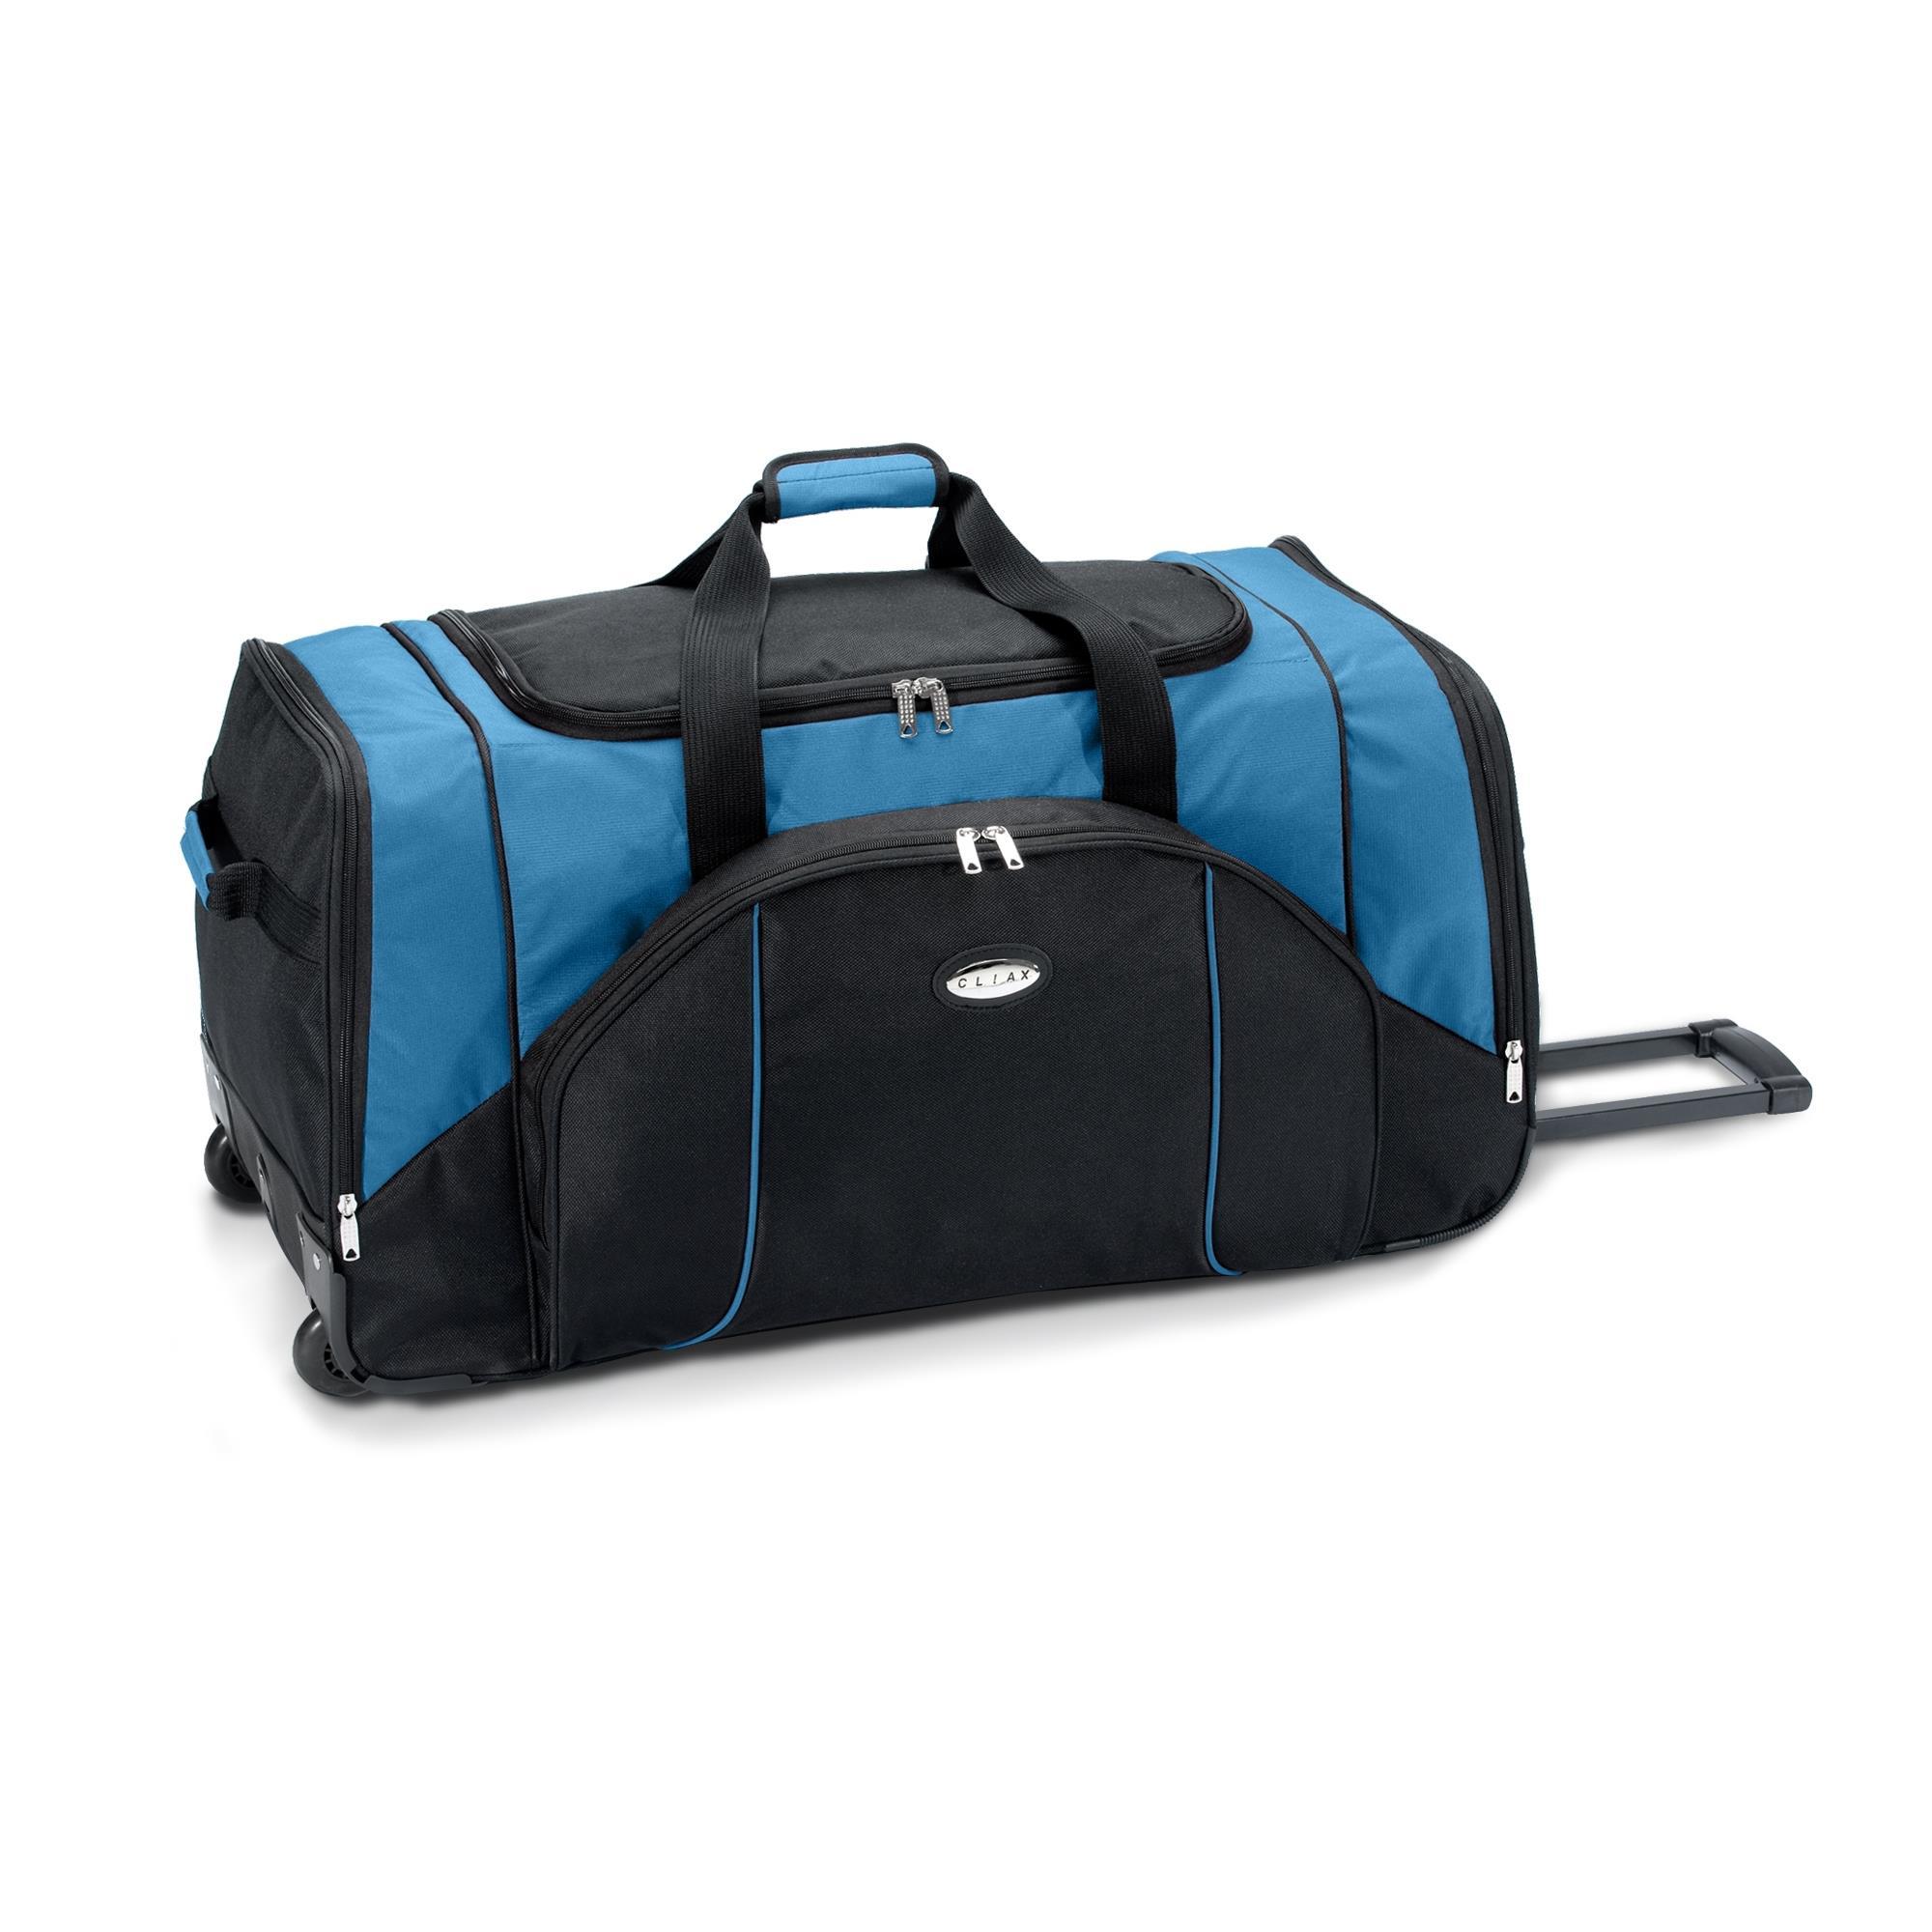 reisetasche trolley koffer mit rollen sporttasche 130l o 95l blau gr n rot grau ebay. Black Bedroom Furniture Sets. Home Design Ideas